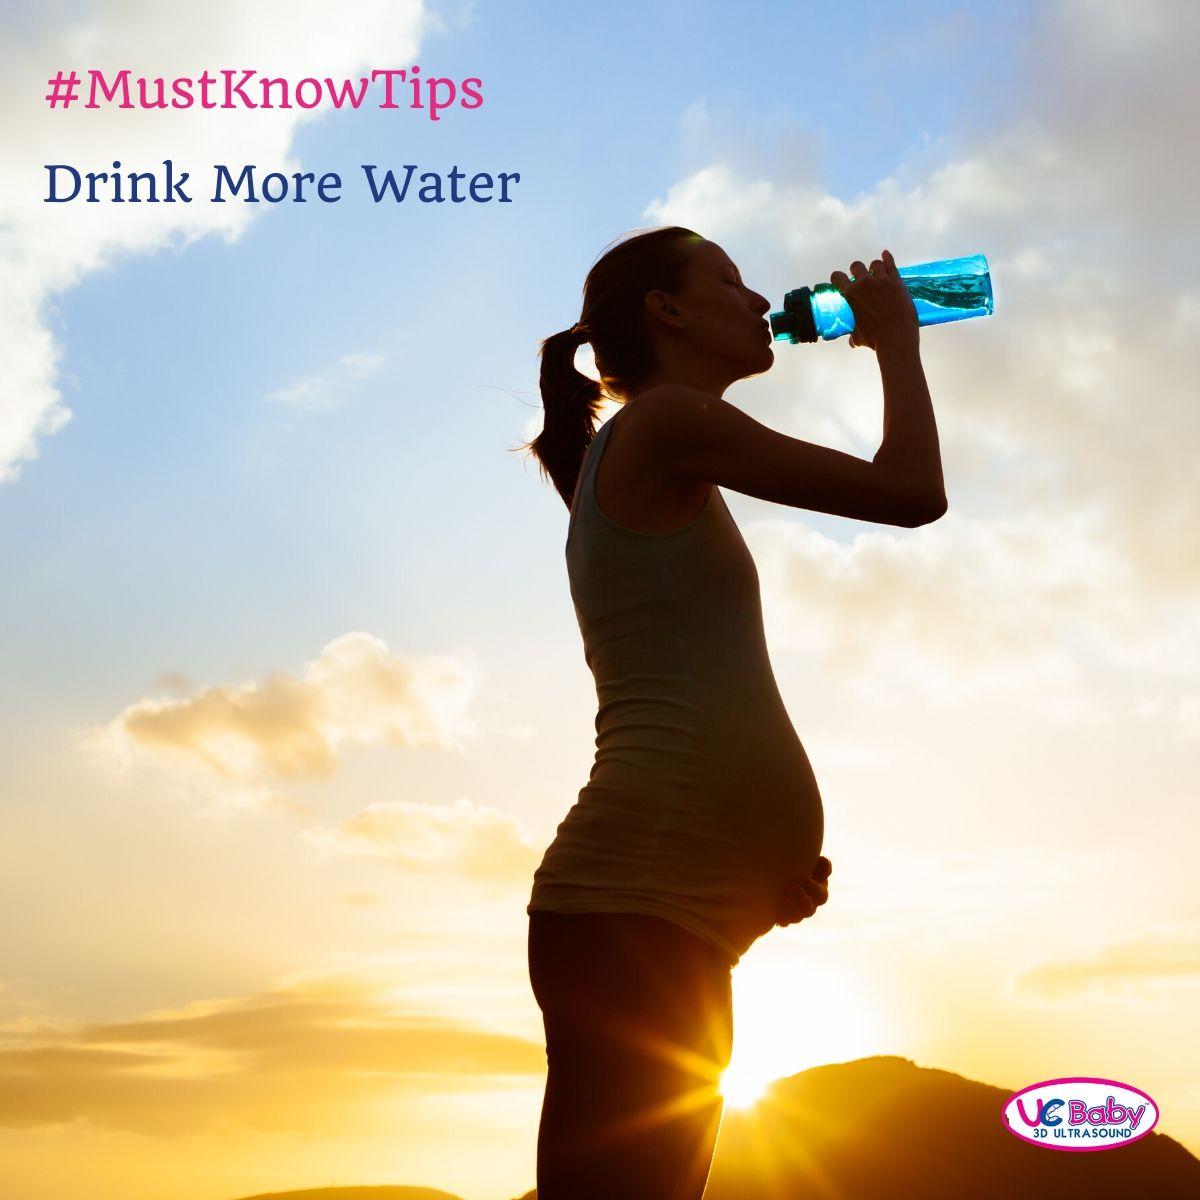 #MustKnowTips - Drink Water